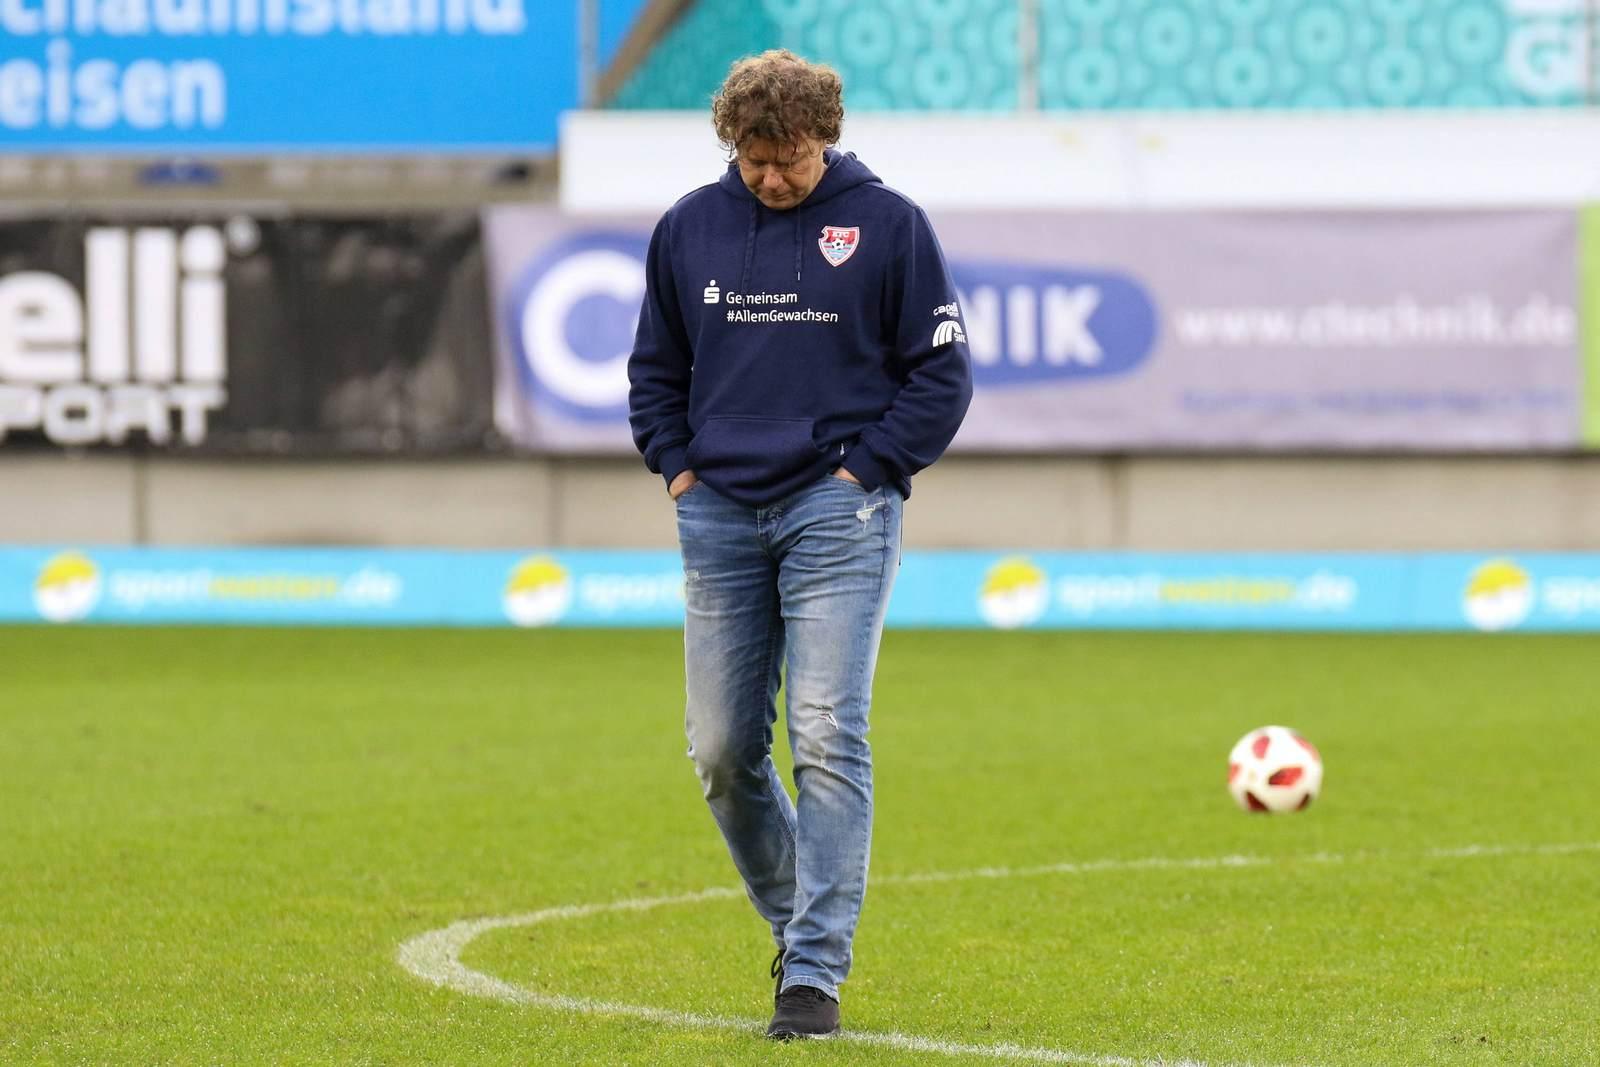 Stefan Krämer als Trainer des KFC Uerdingen